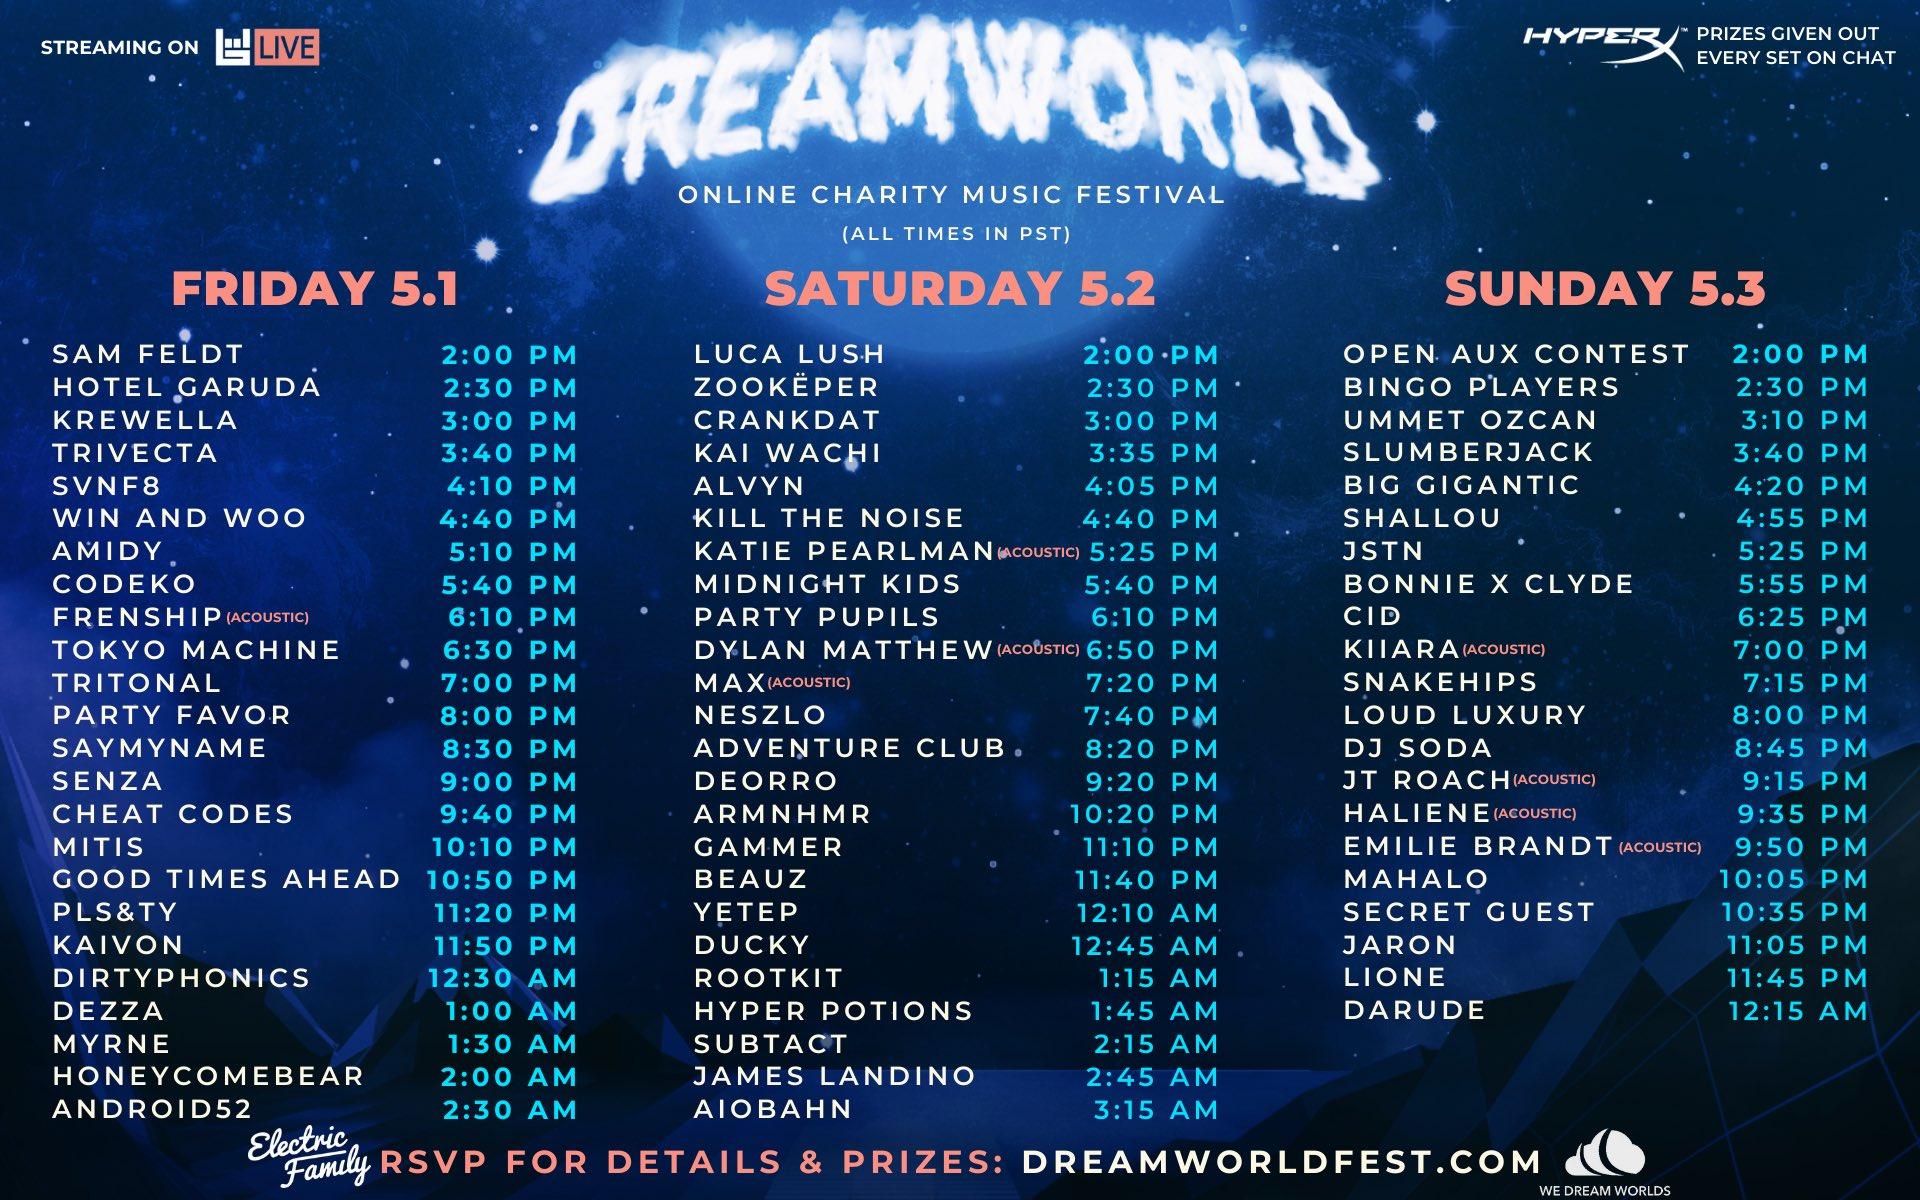 Dreamworld Online Charity Festival - Schedule